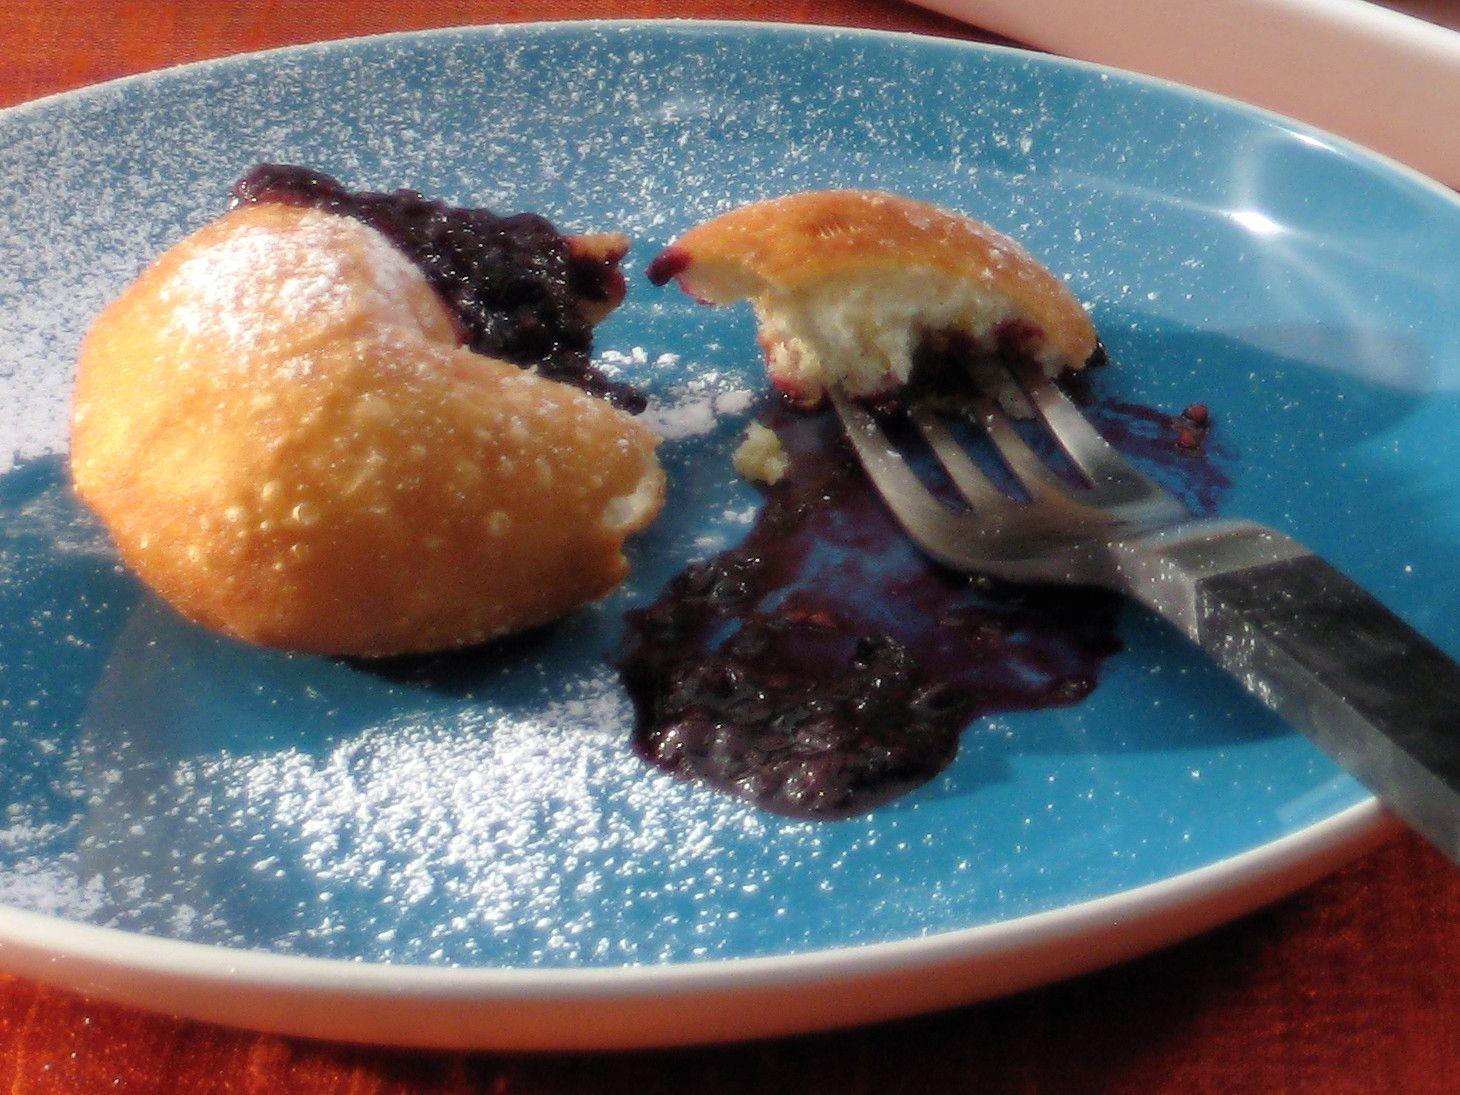 Beignets with quick homemade blackberry jam recipe homemade beignets with quick homemade blackberry jam forumfinder Choice Image